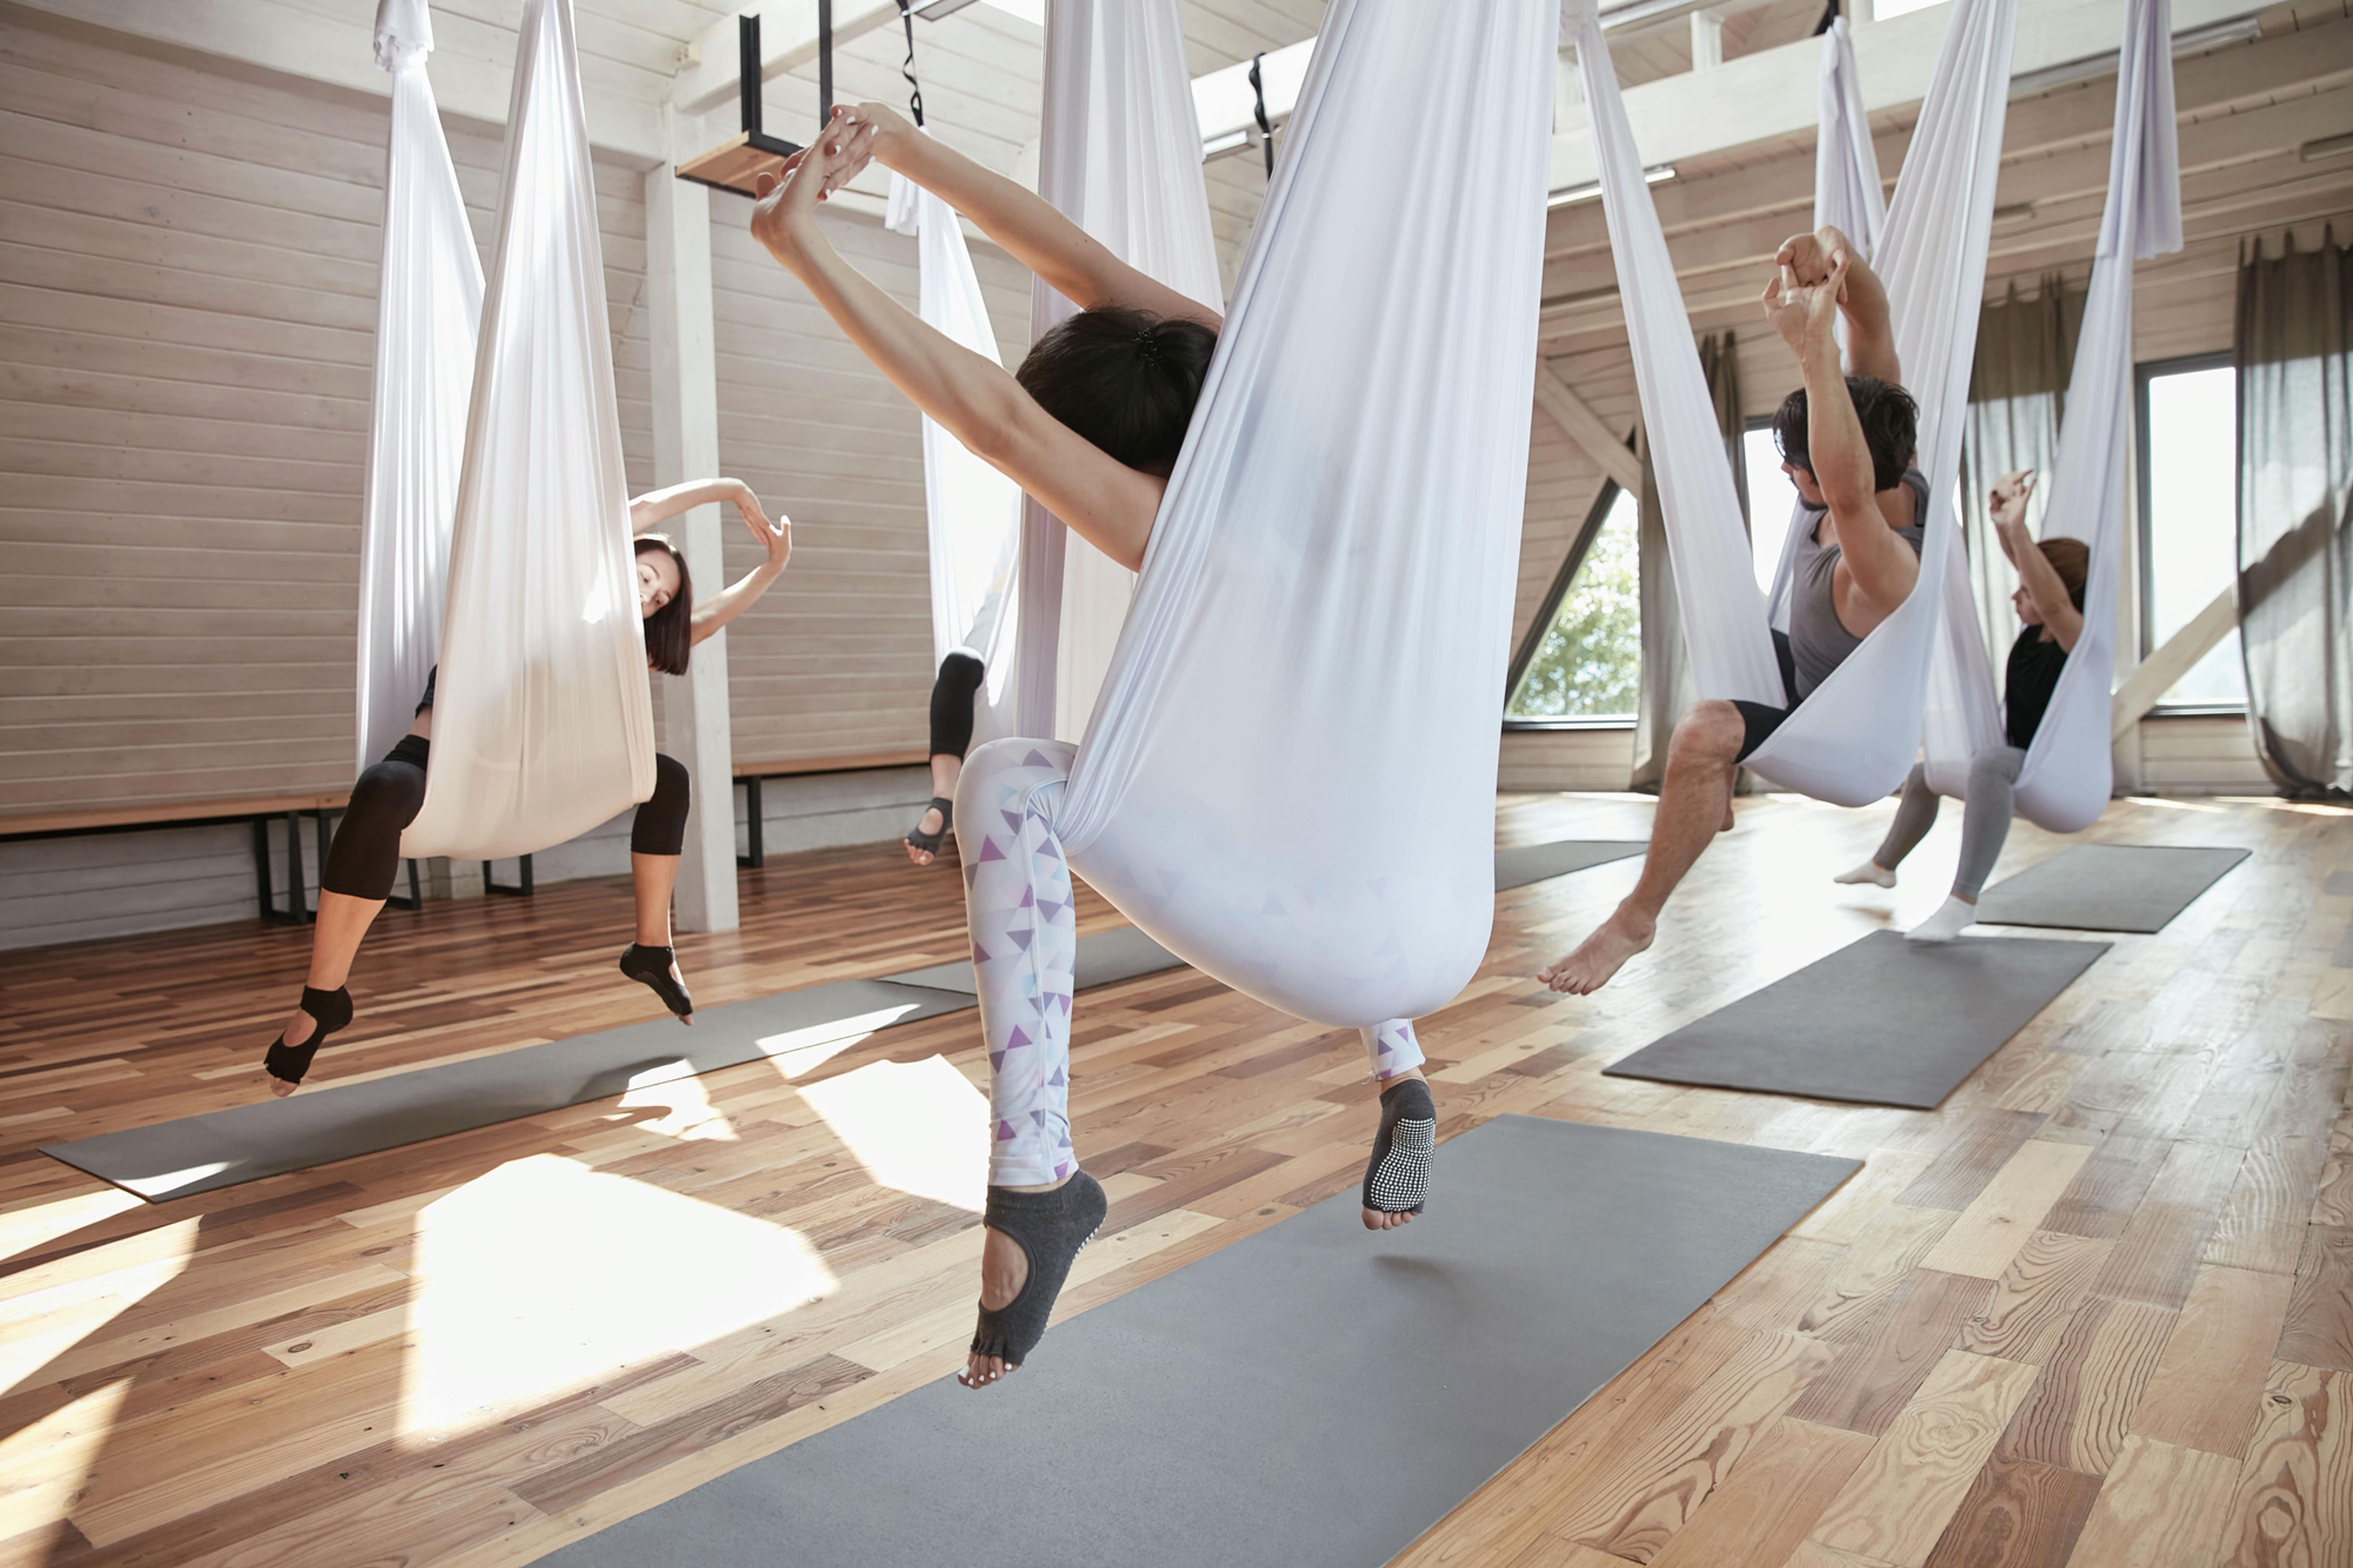 Mi. 18:30 - Flying Yoga Level I